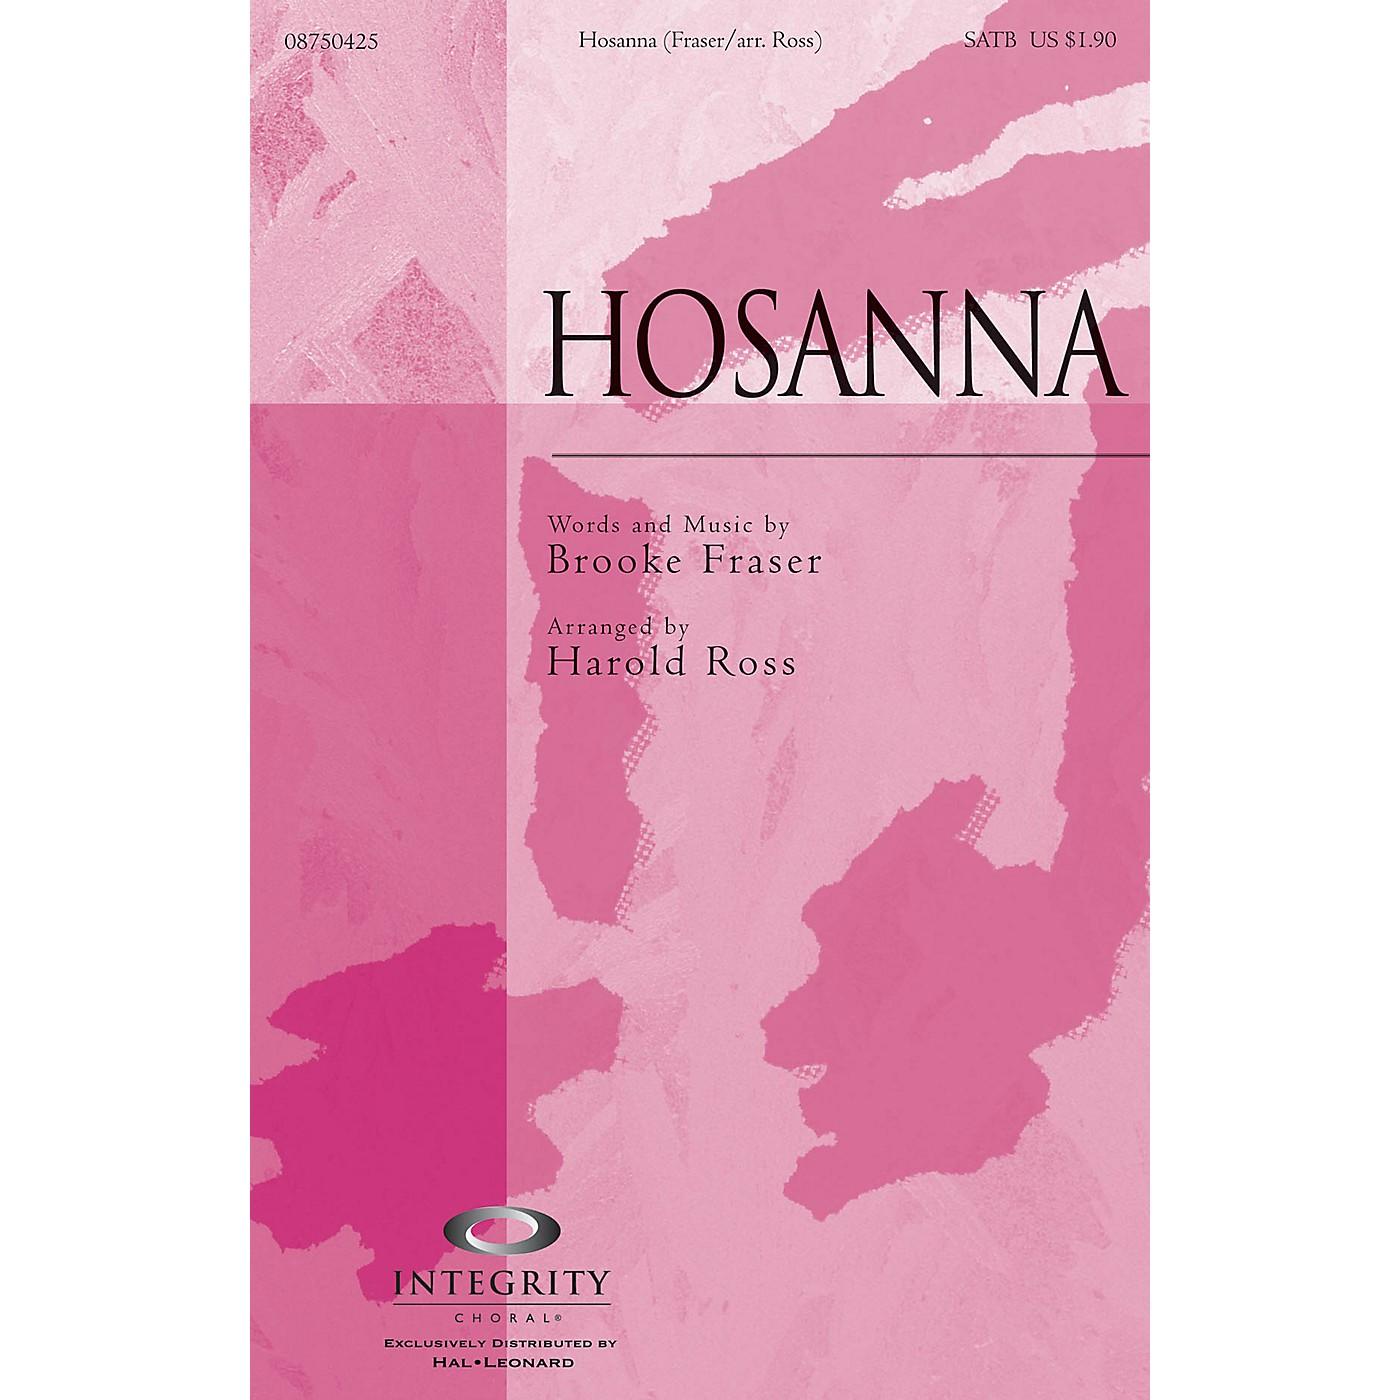 Integrity Choral Hosanna SATB Arranged by Harold Ross thumbnail